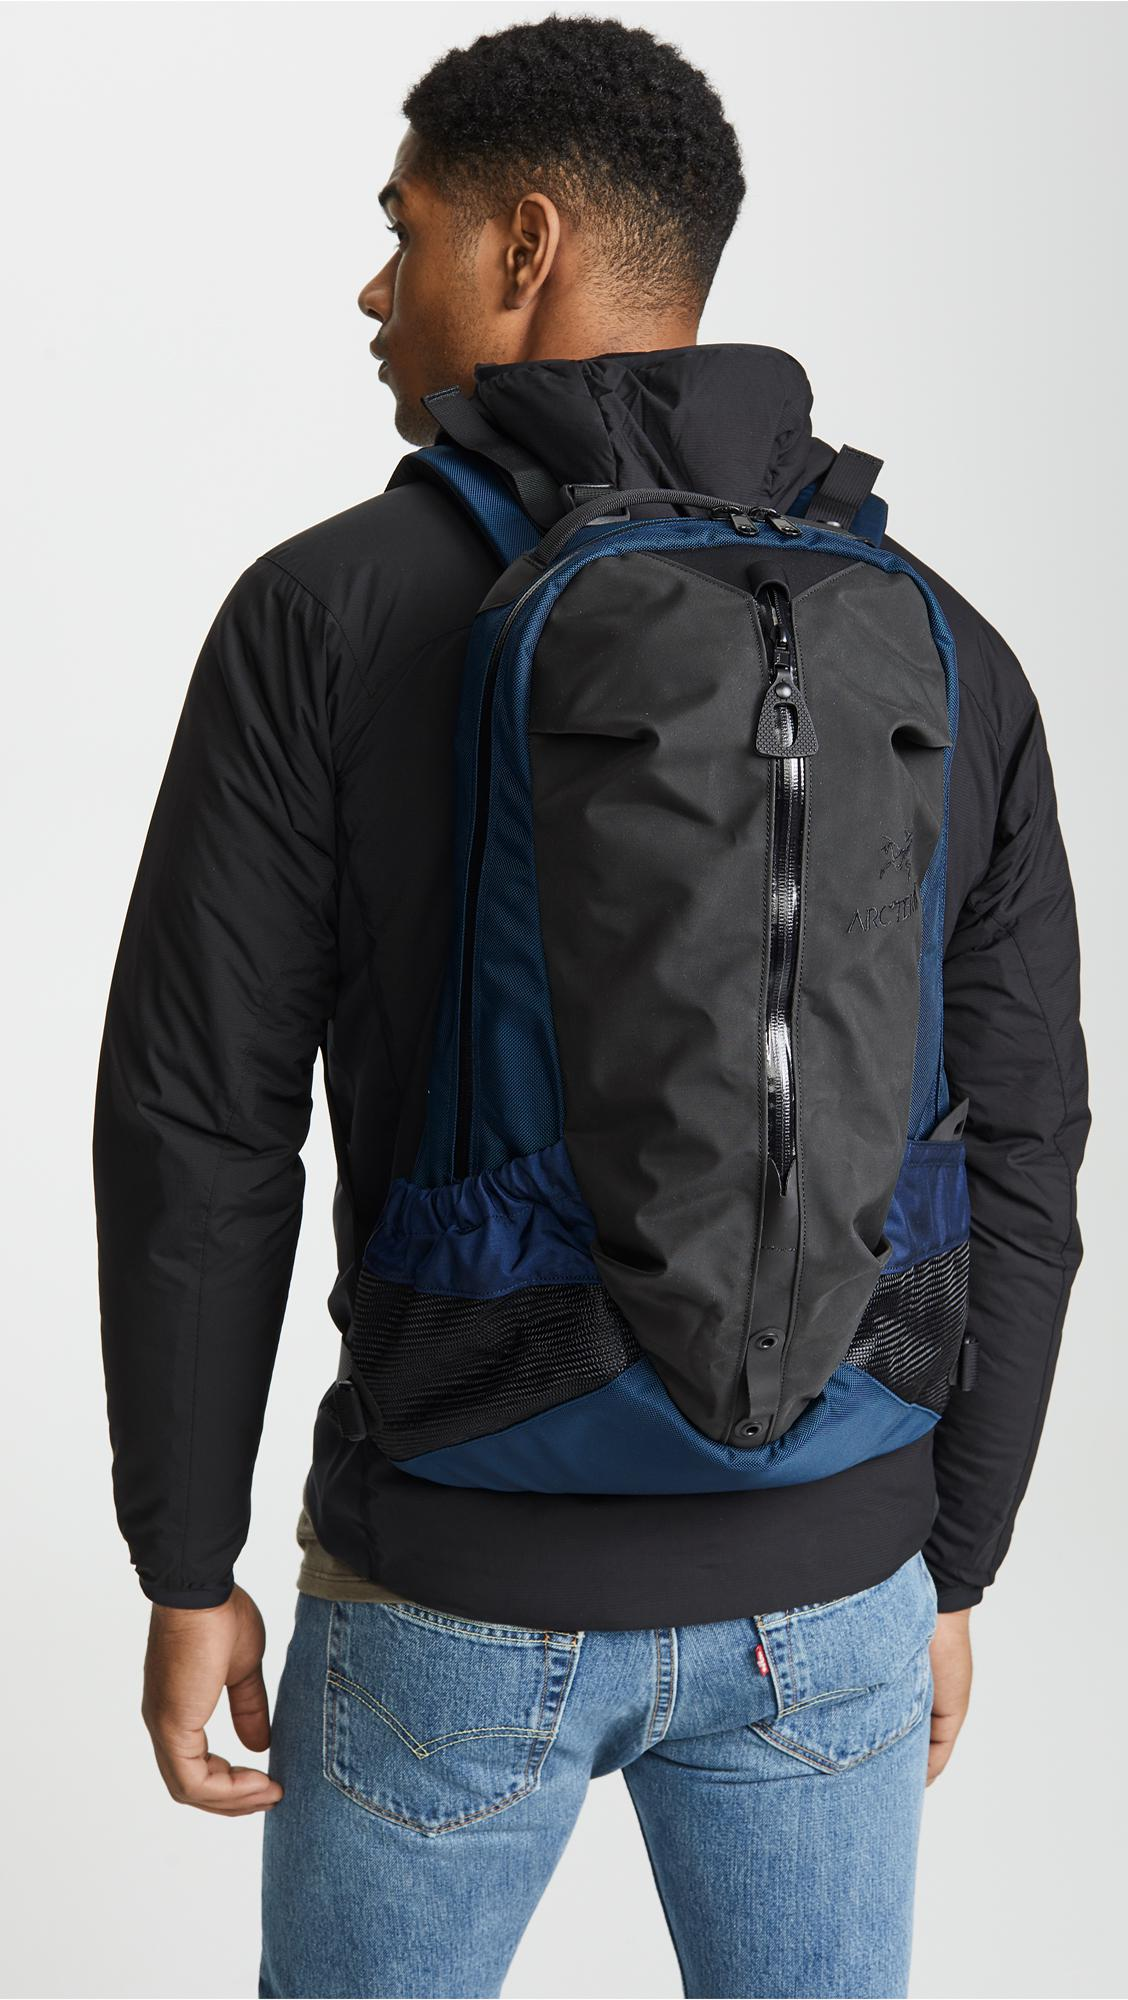 Arc'teryx Arro 22 Backpack in Blue for Men - Lyst